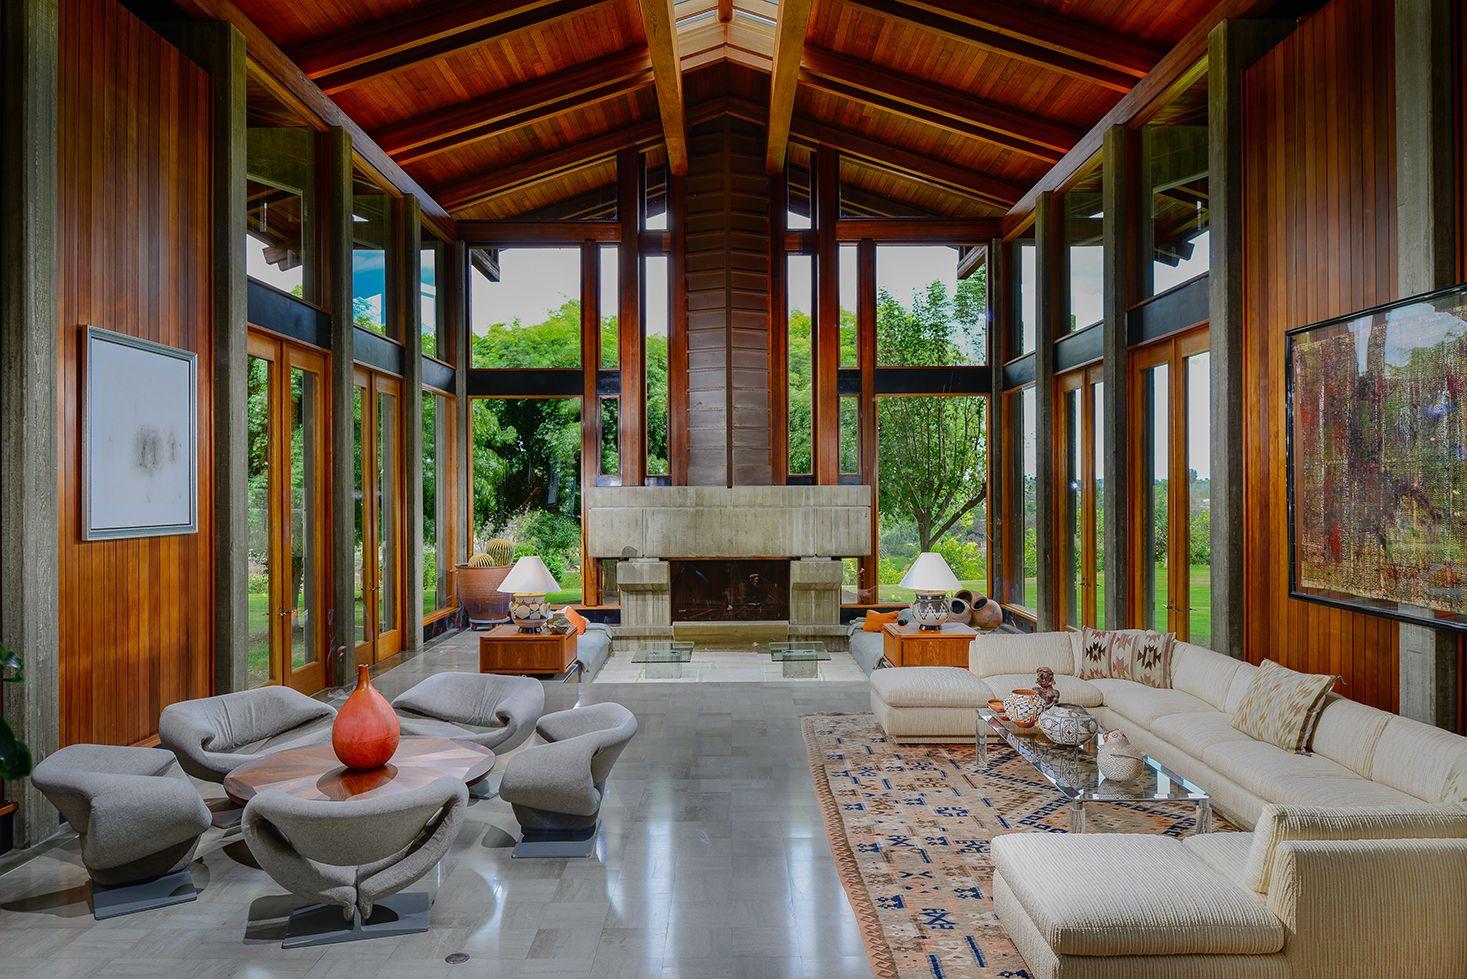 Del dios ranch stunning interiors designed by arthur elrod in this rancho santa fe home also rh pinterest